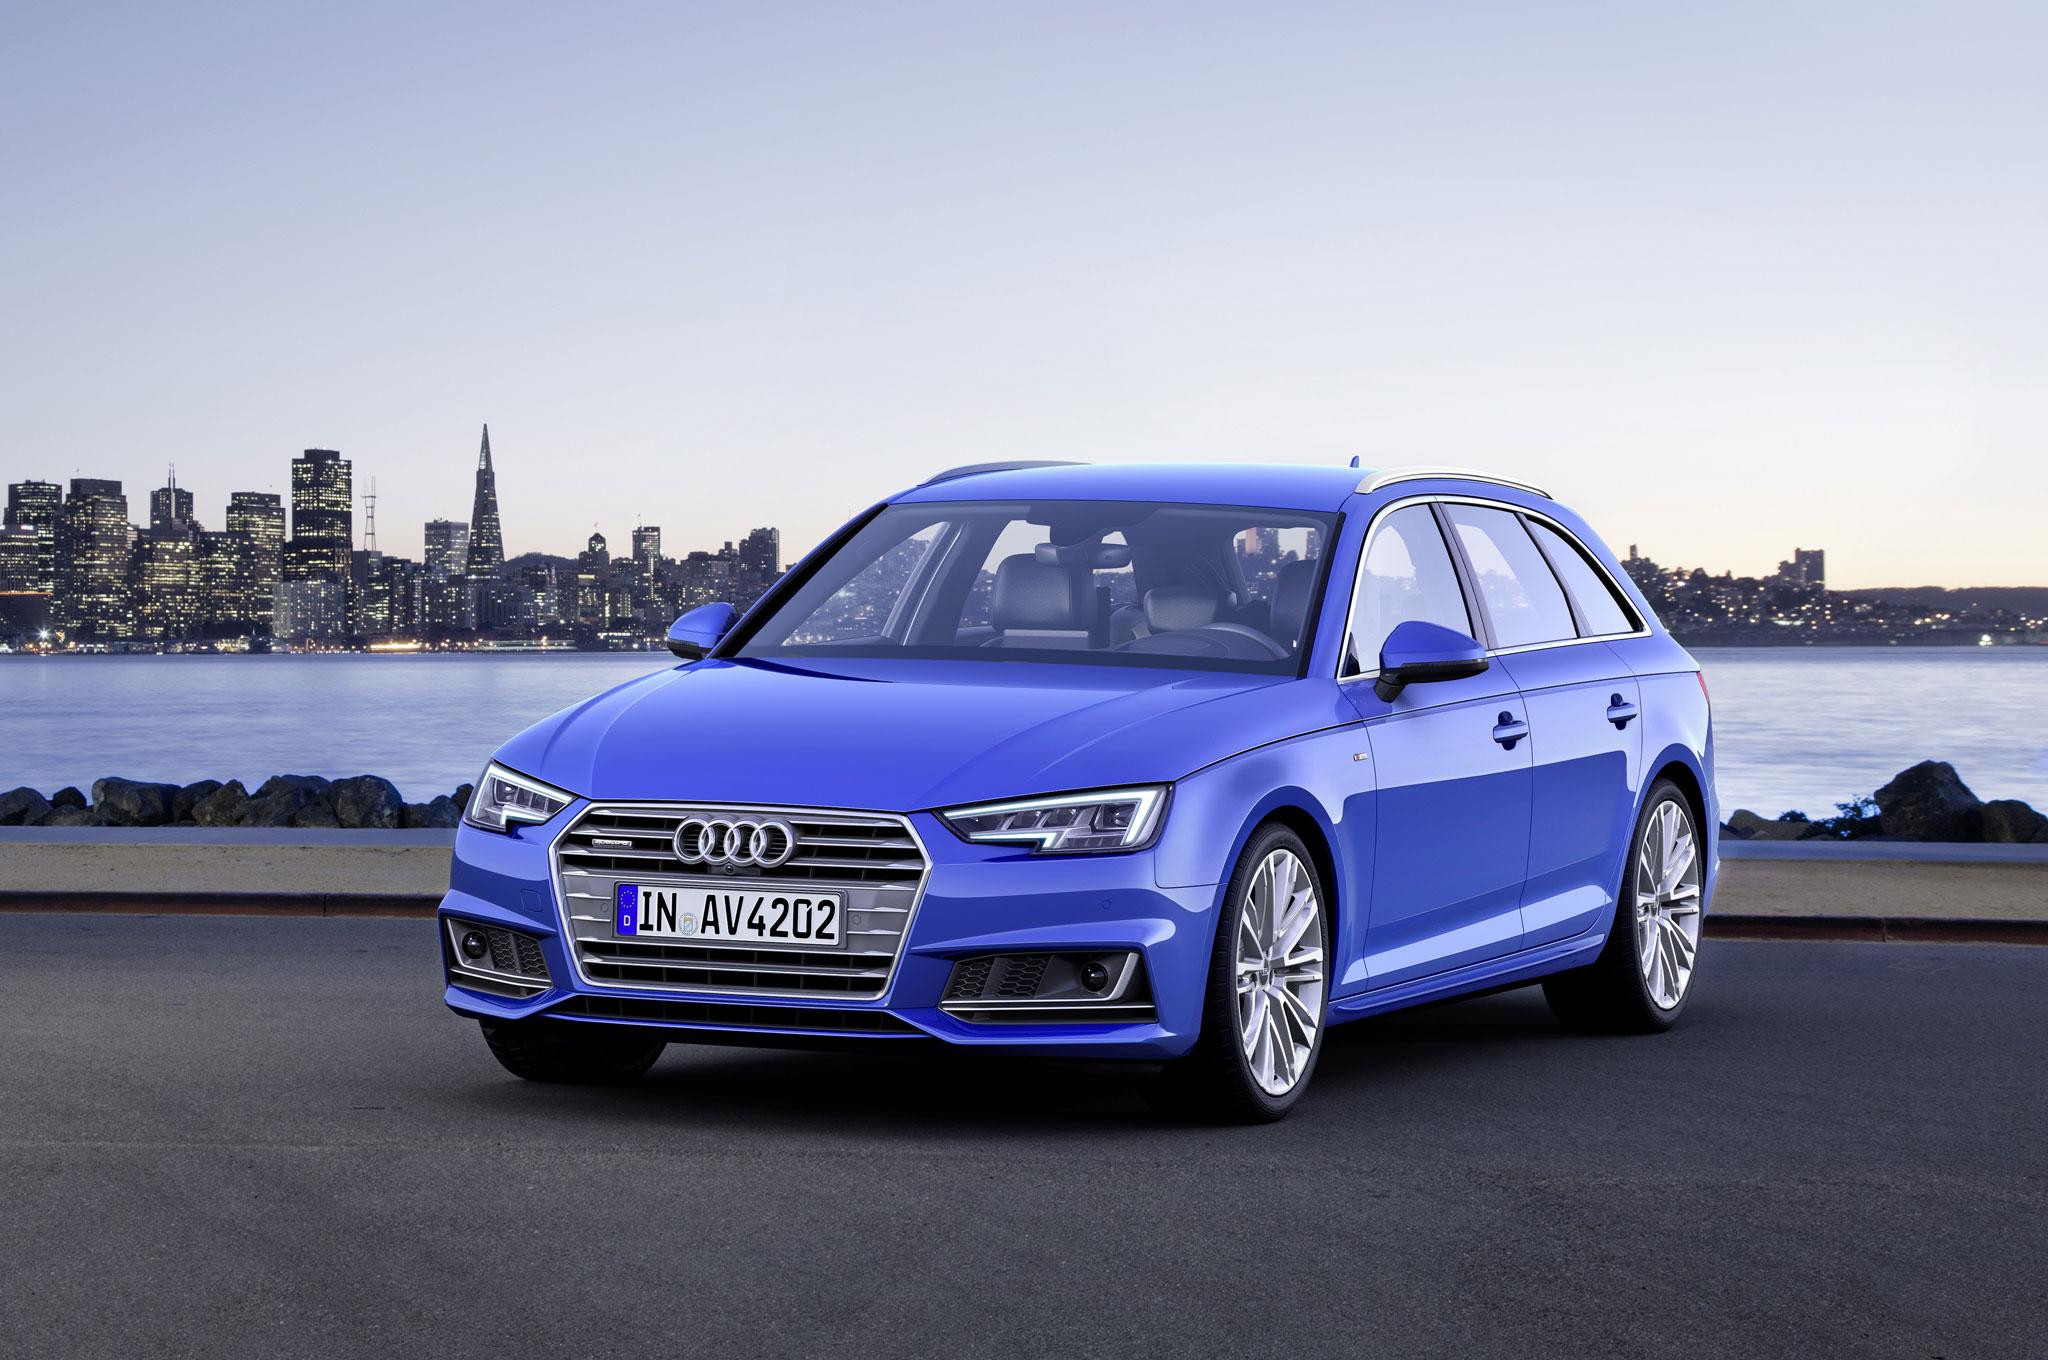 2017 Audi A4 2.0T TFSI Quattro Review